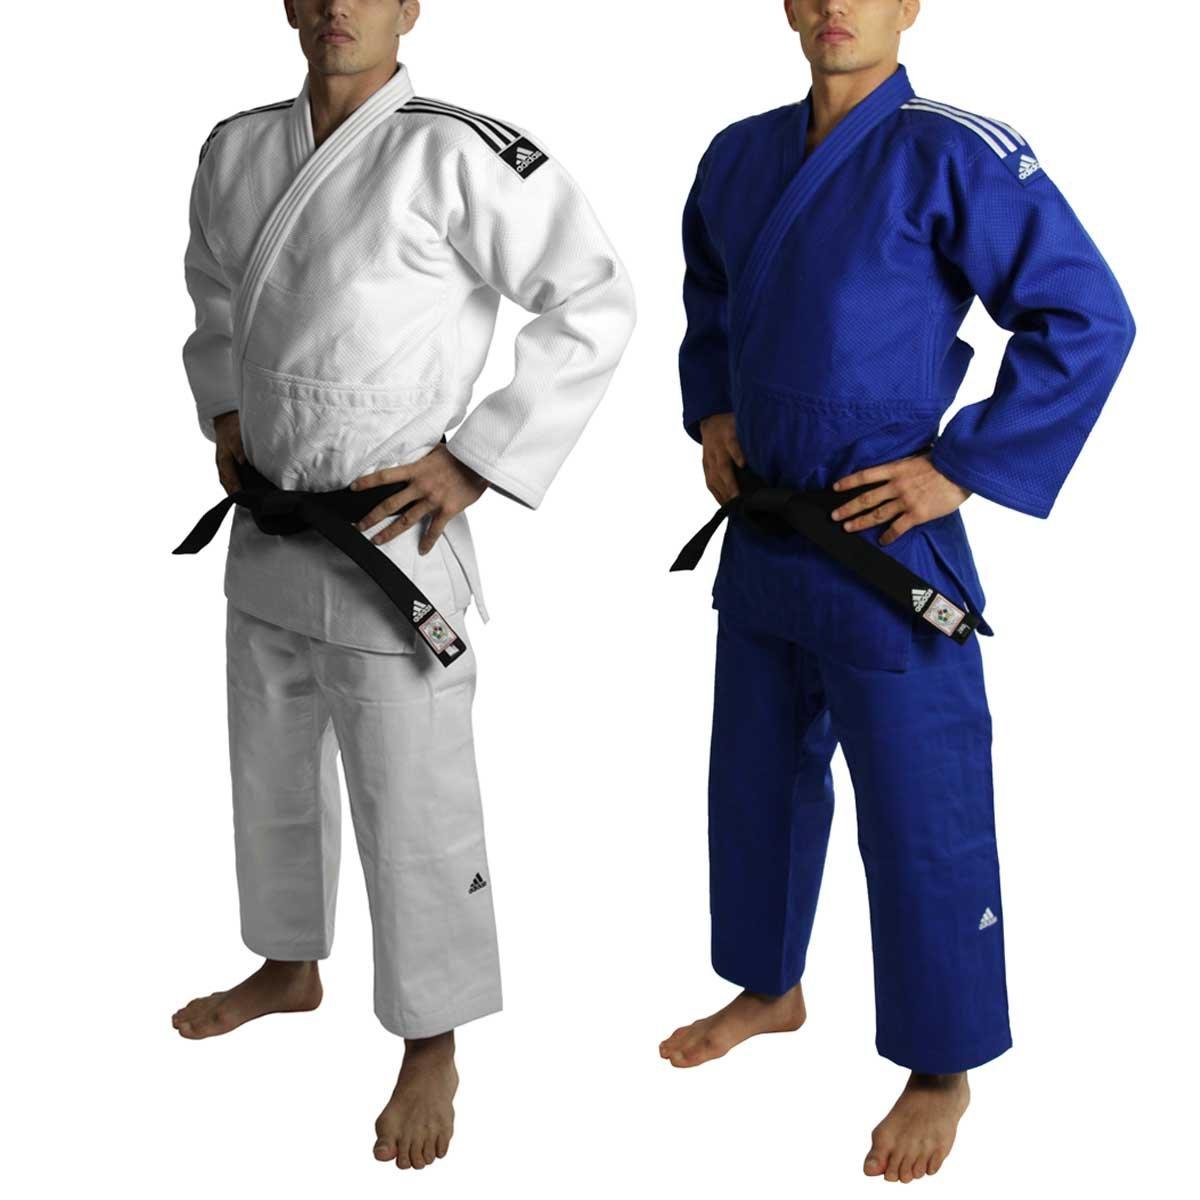 Adidas - Judogi Adidas J730 Champion II Slimfit IJF color blanco con rayas negras